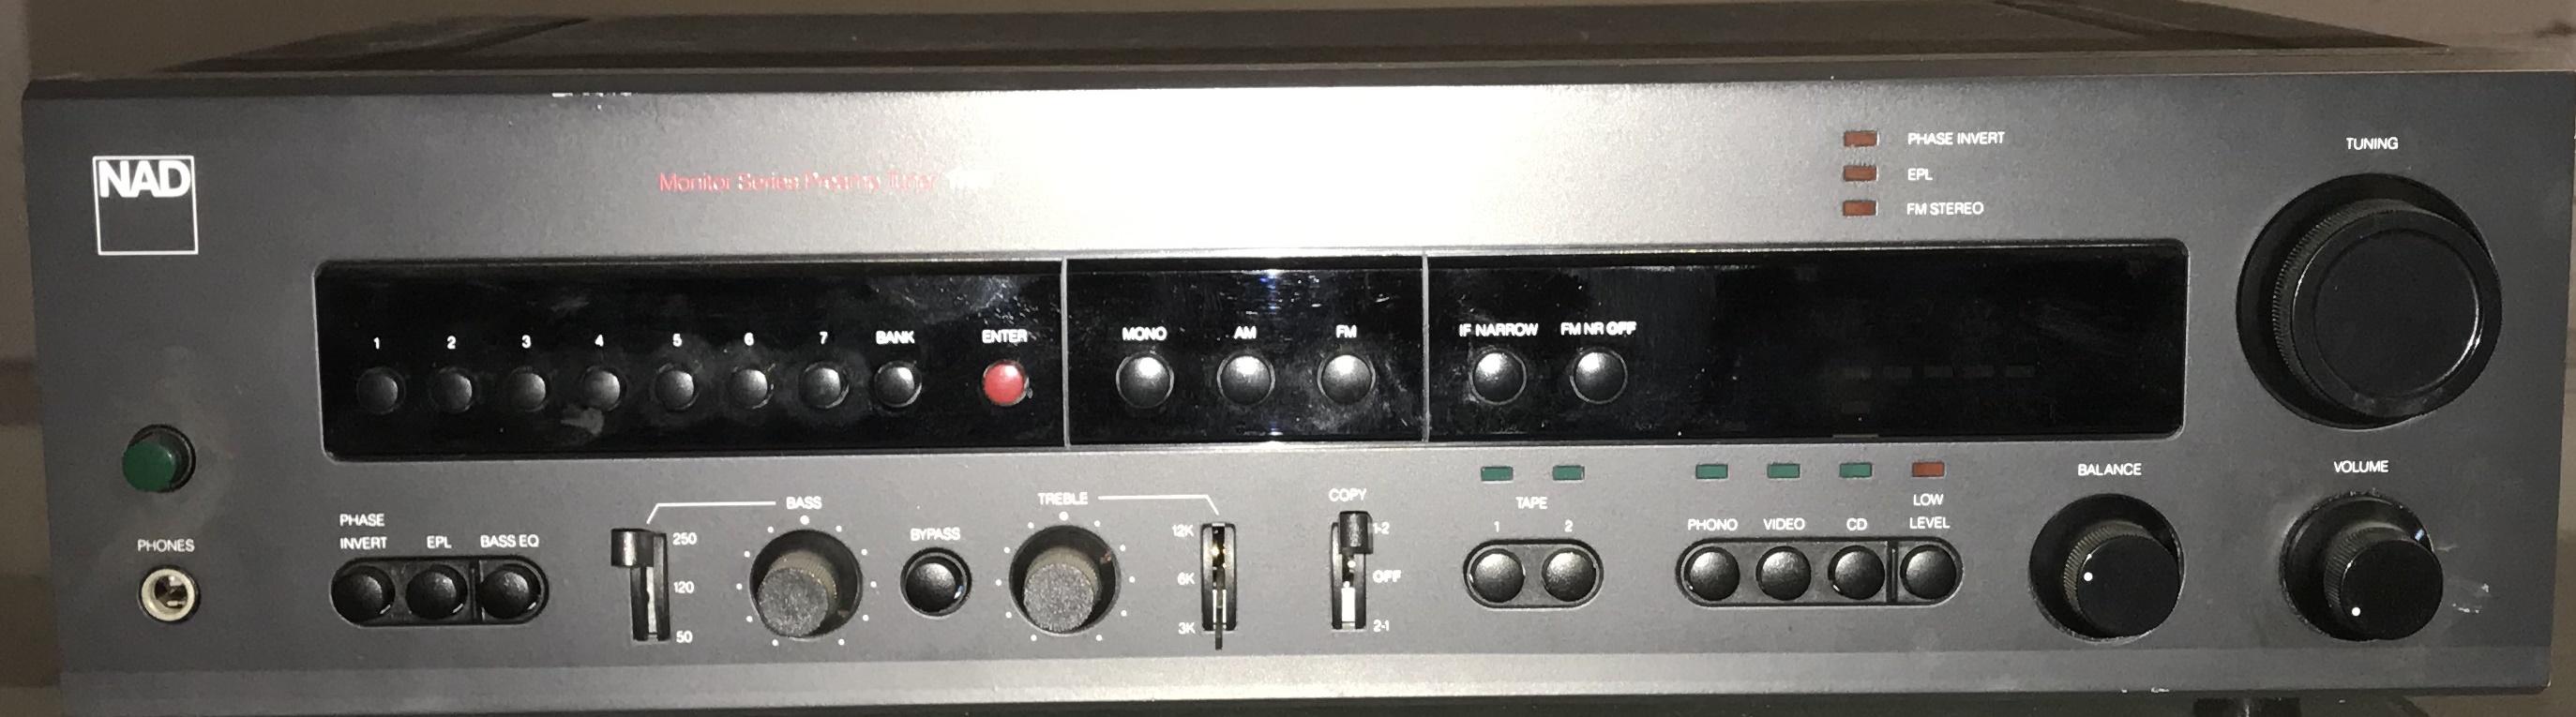 NAD_Monitor_Stereo_Receiver_Pre_Amp.jpg